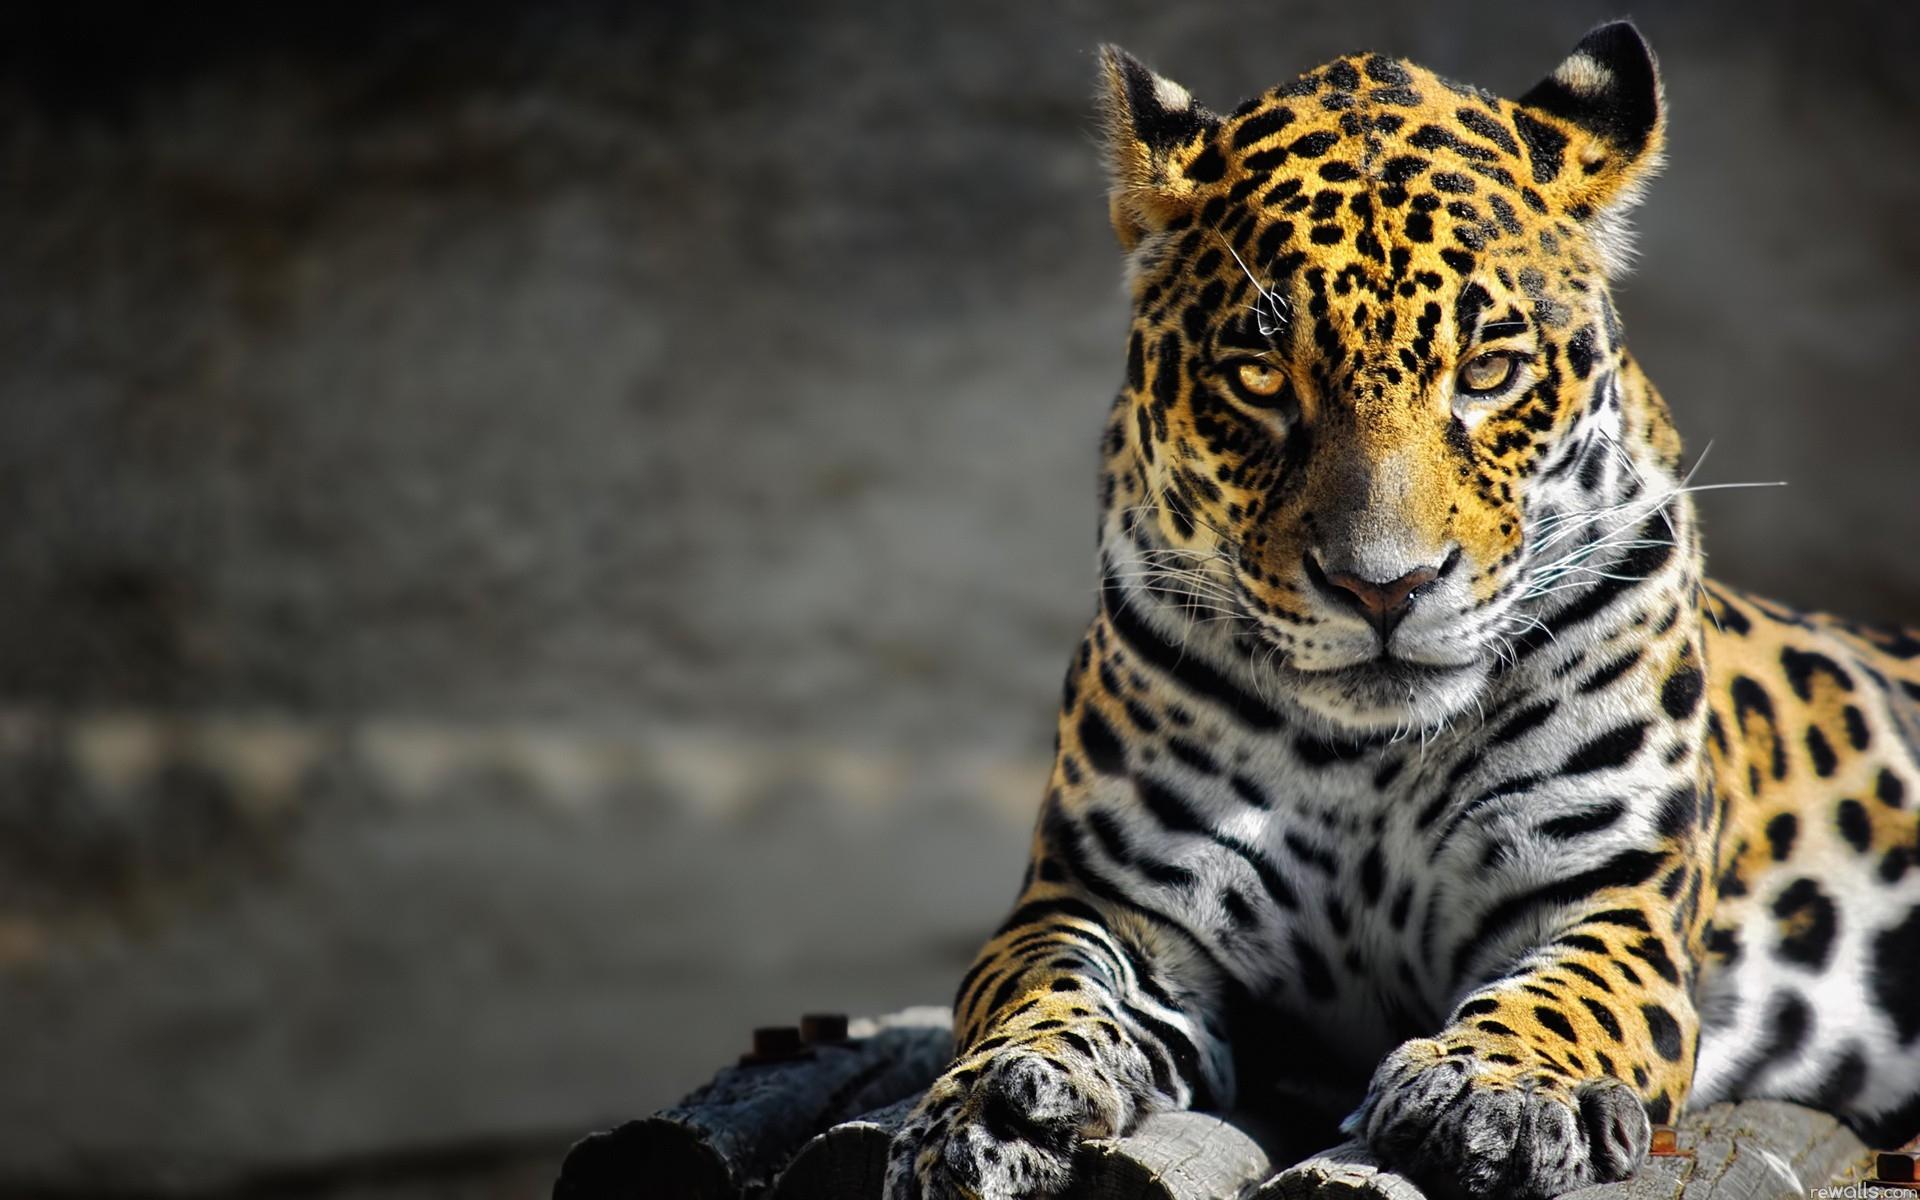 wallpaper : wildlife, big cats, whiskers, leopard, jaguar, cheetah